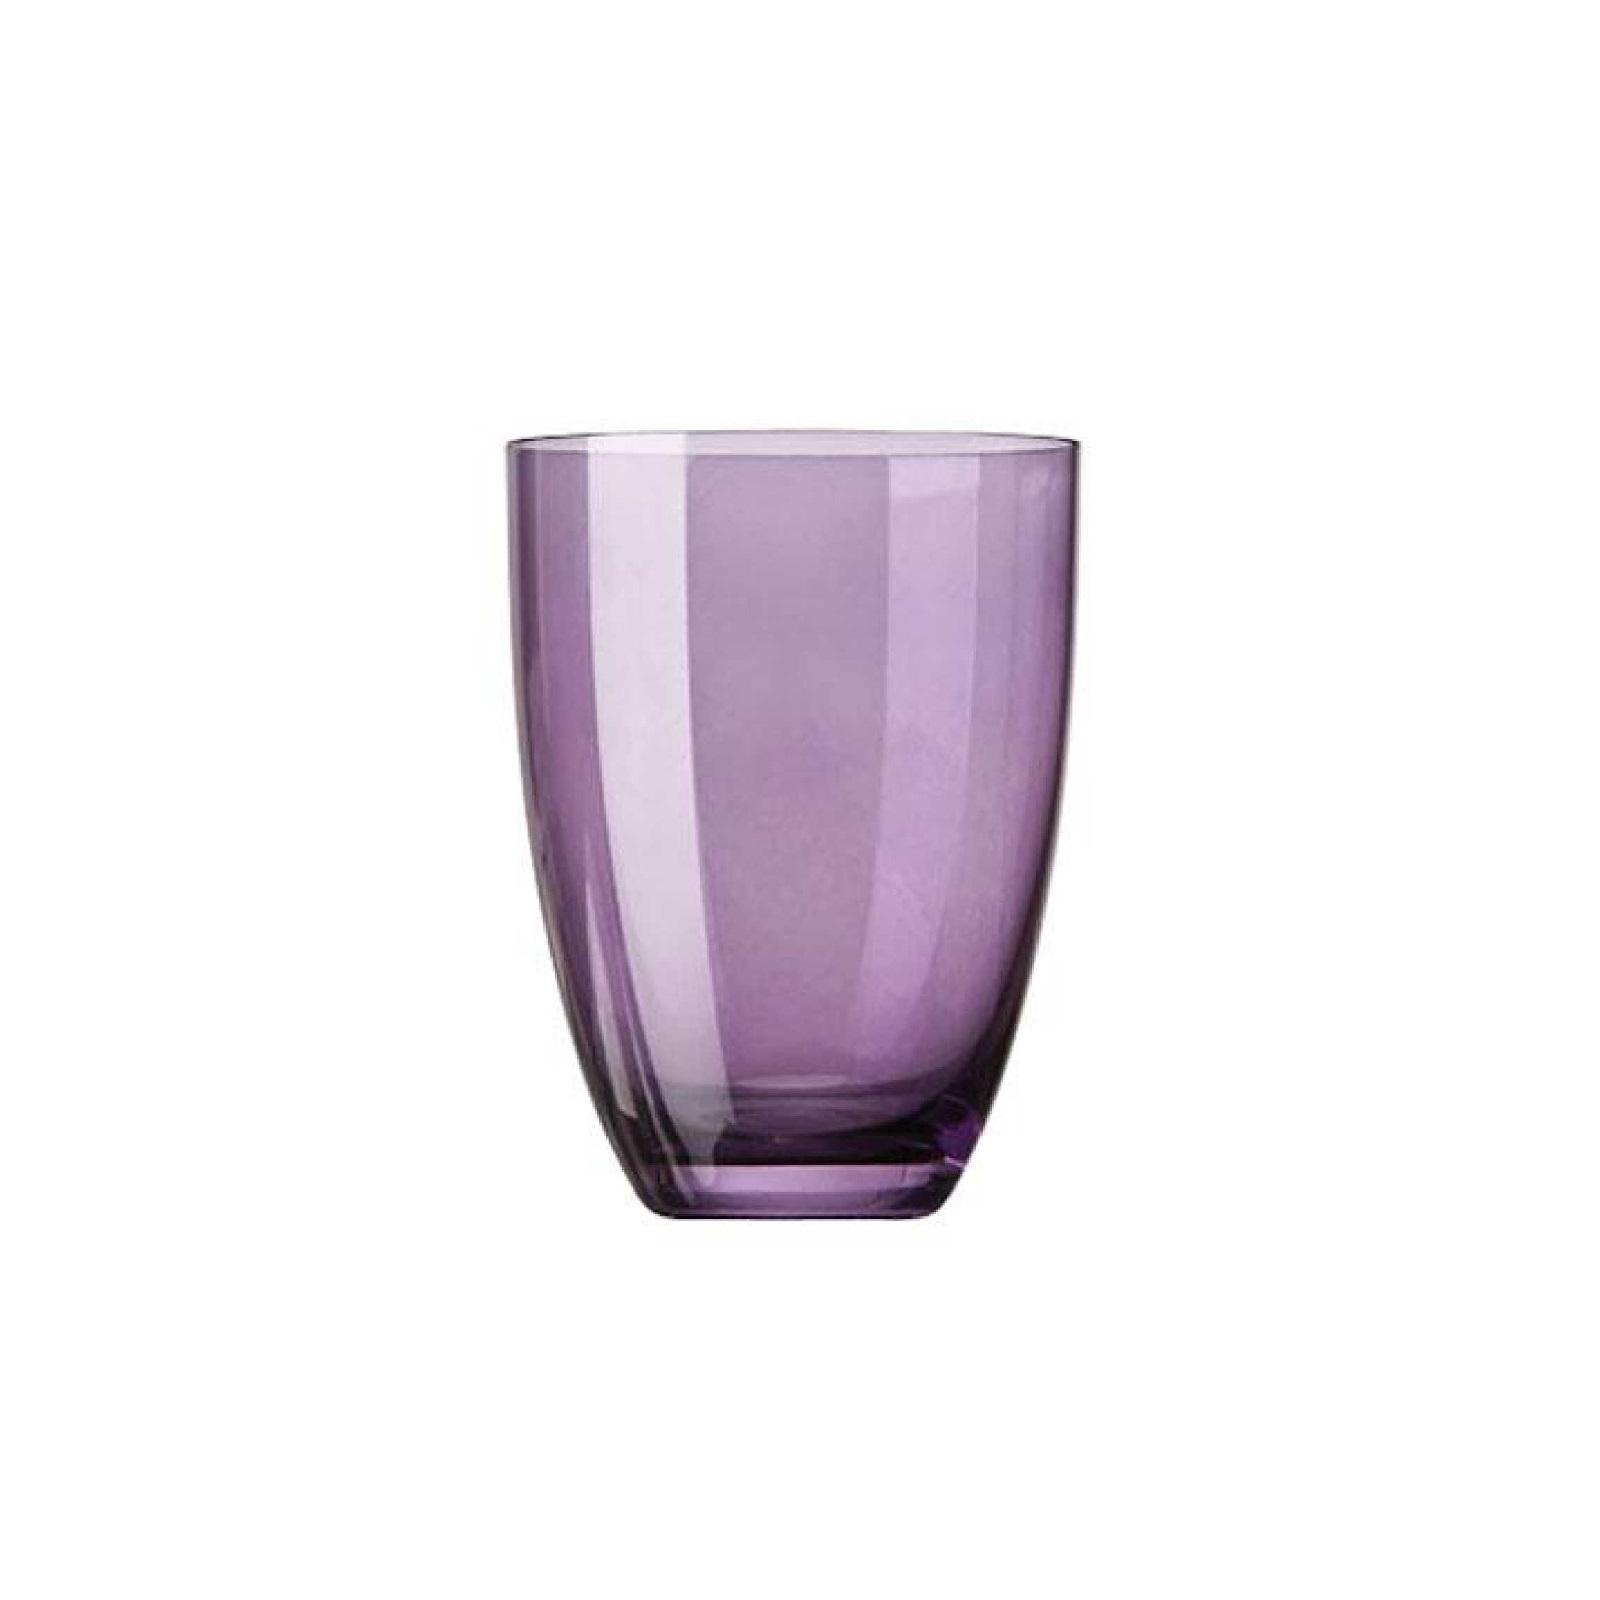 Стакан стеклянный Rosenthal SUNNY DAY, объем 0,32 л, фиолетовый Rosenthal 69034-408531-40140 фото 2